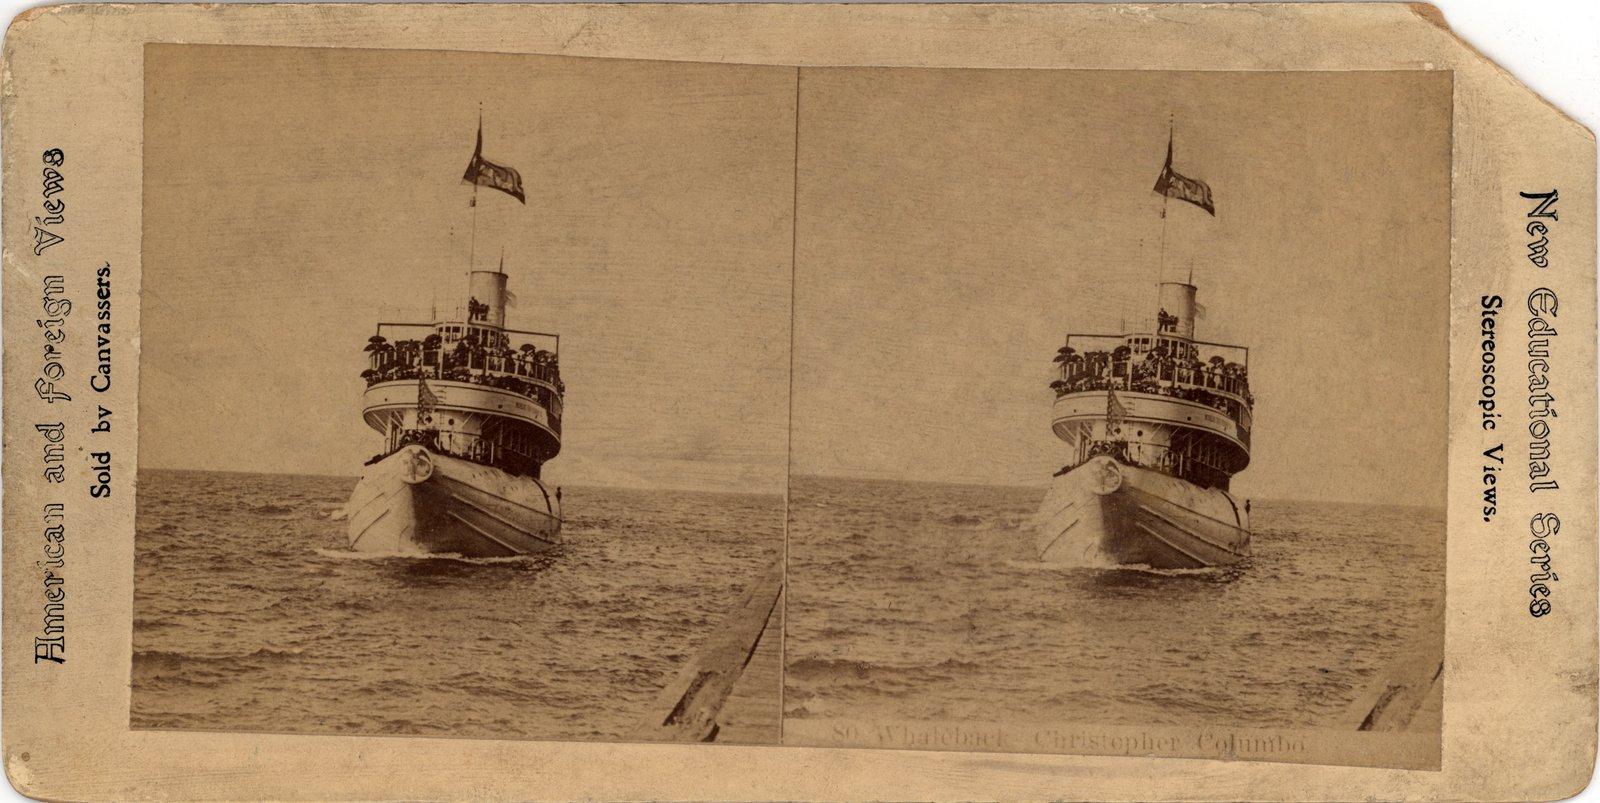 Whaleback Christopher Columbus